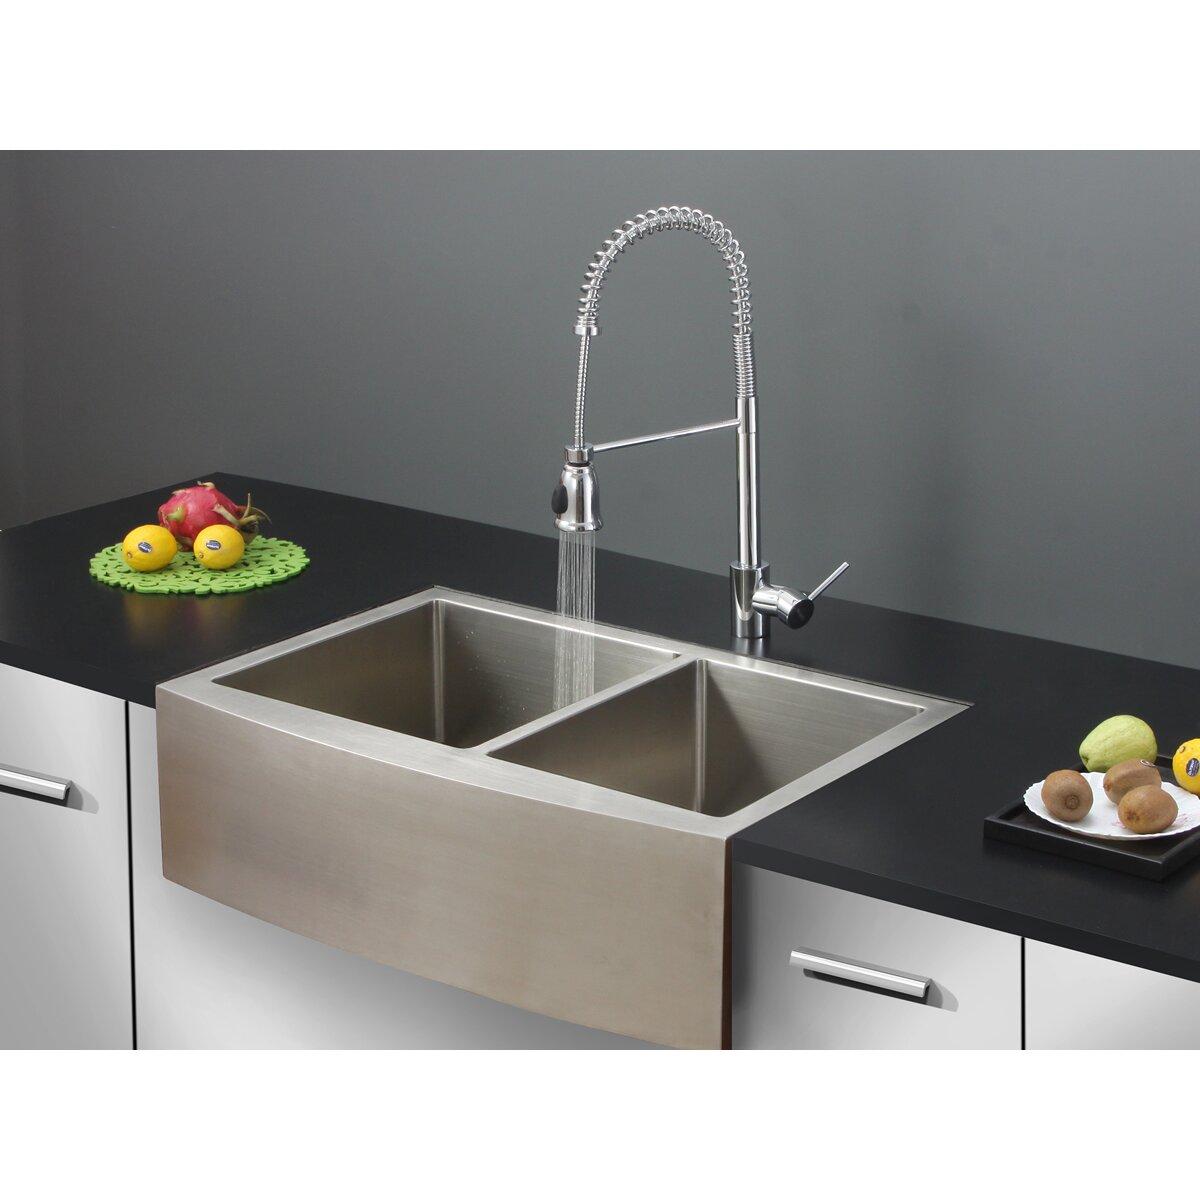 ruvati 33 quot x 22 quot kitchen sink with faucet reviews wayfair